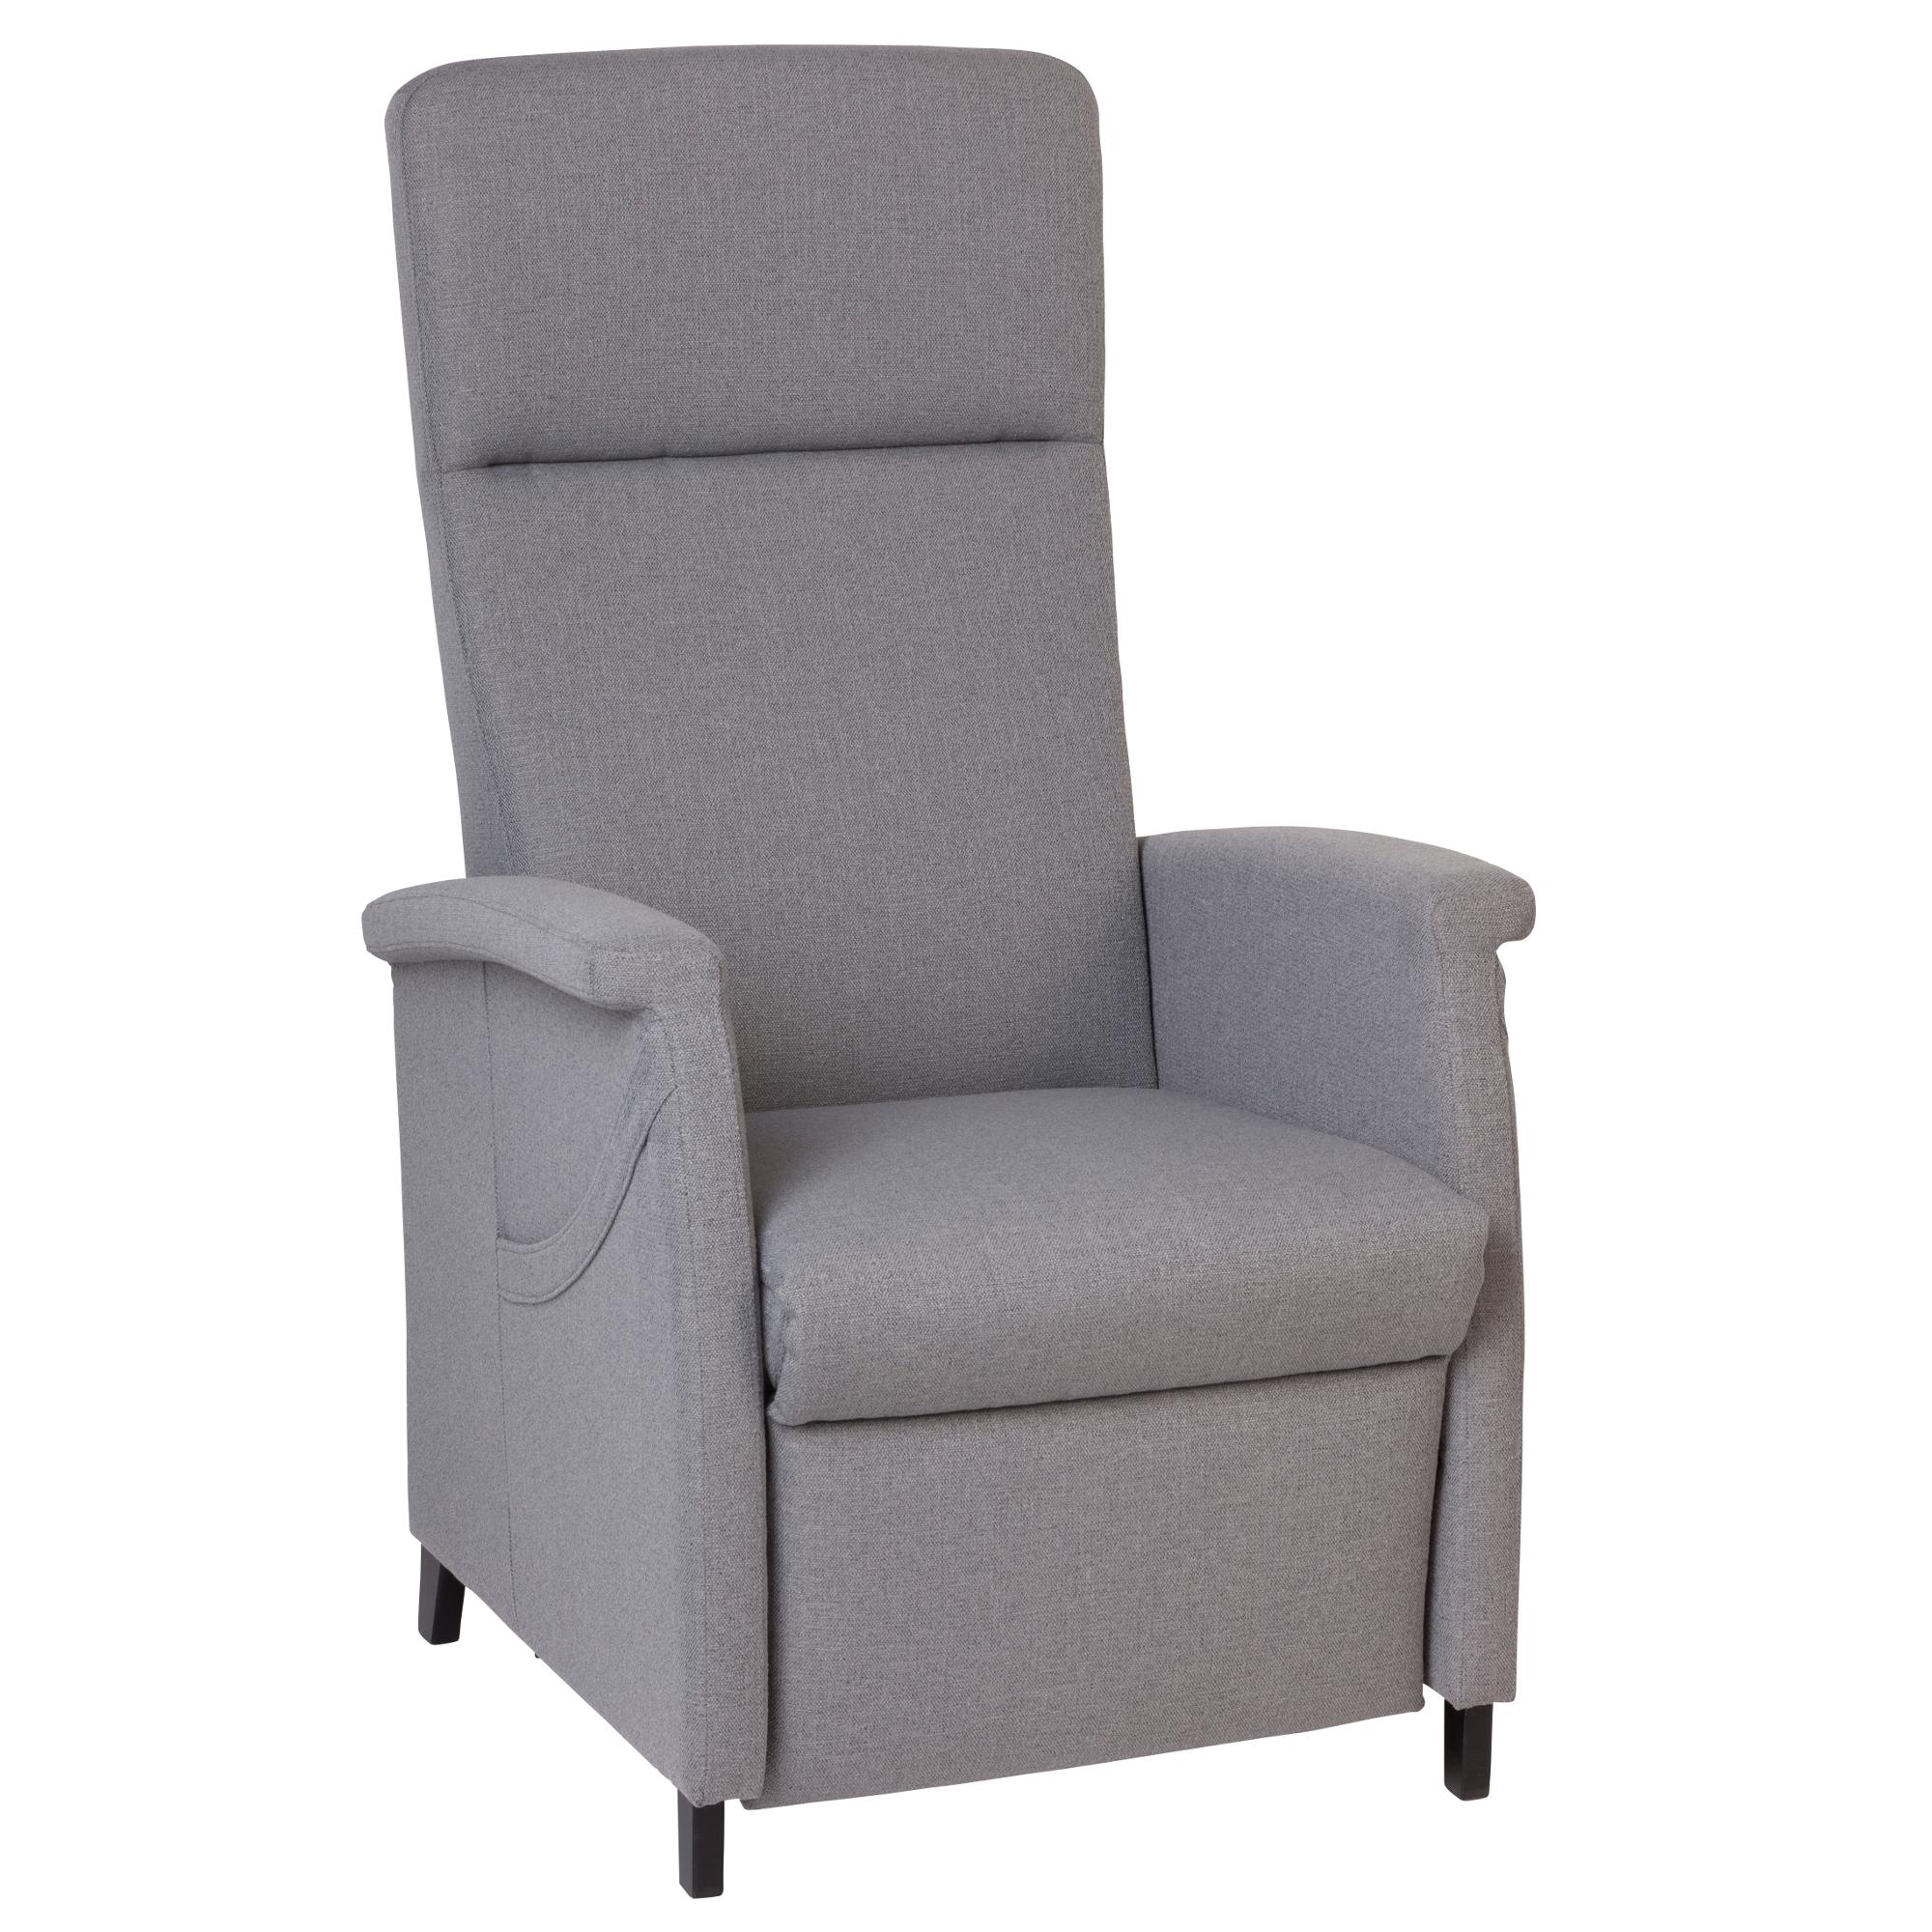 fitform 580 elevo sta op stoel schipper compact wonen